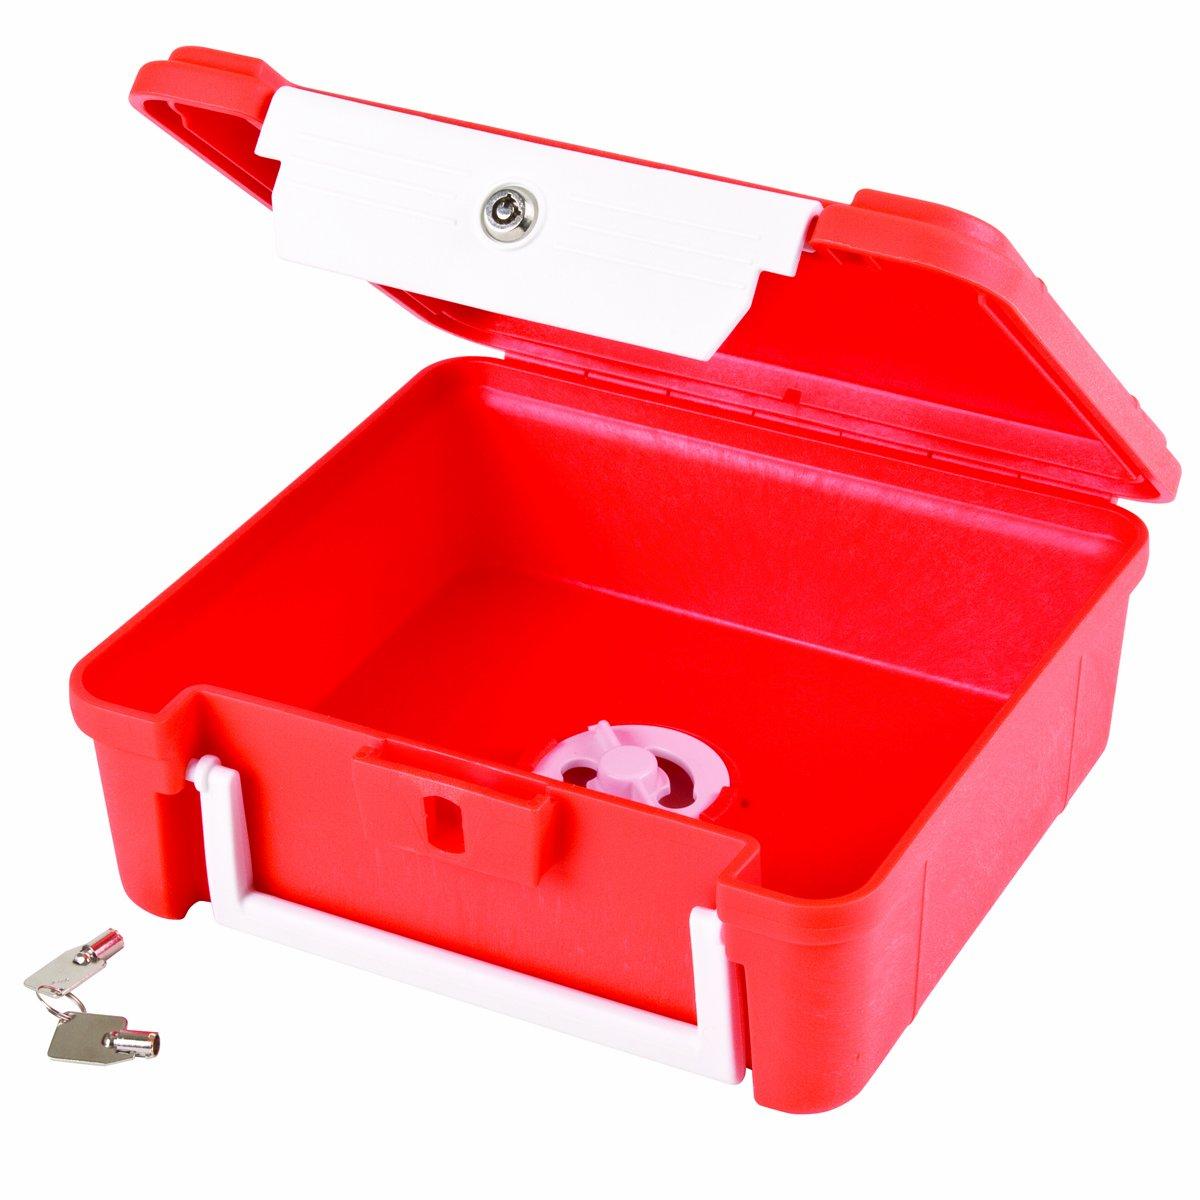 Parent Units Child Safety Medicine Box